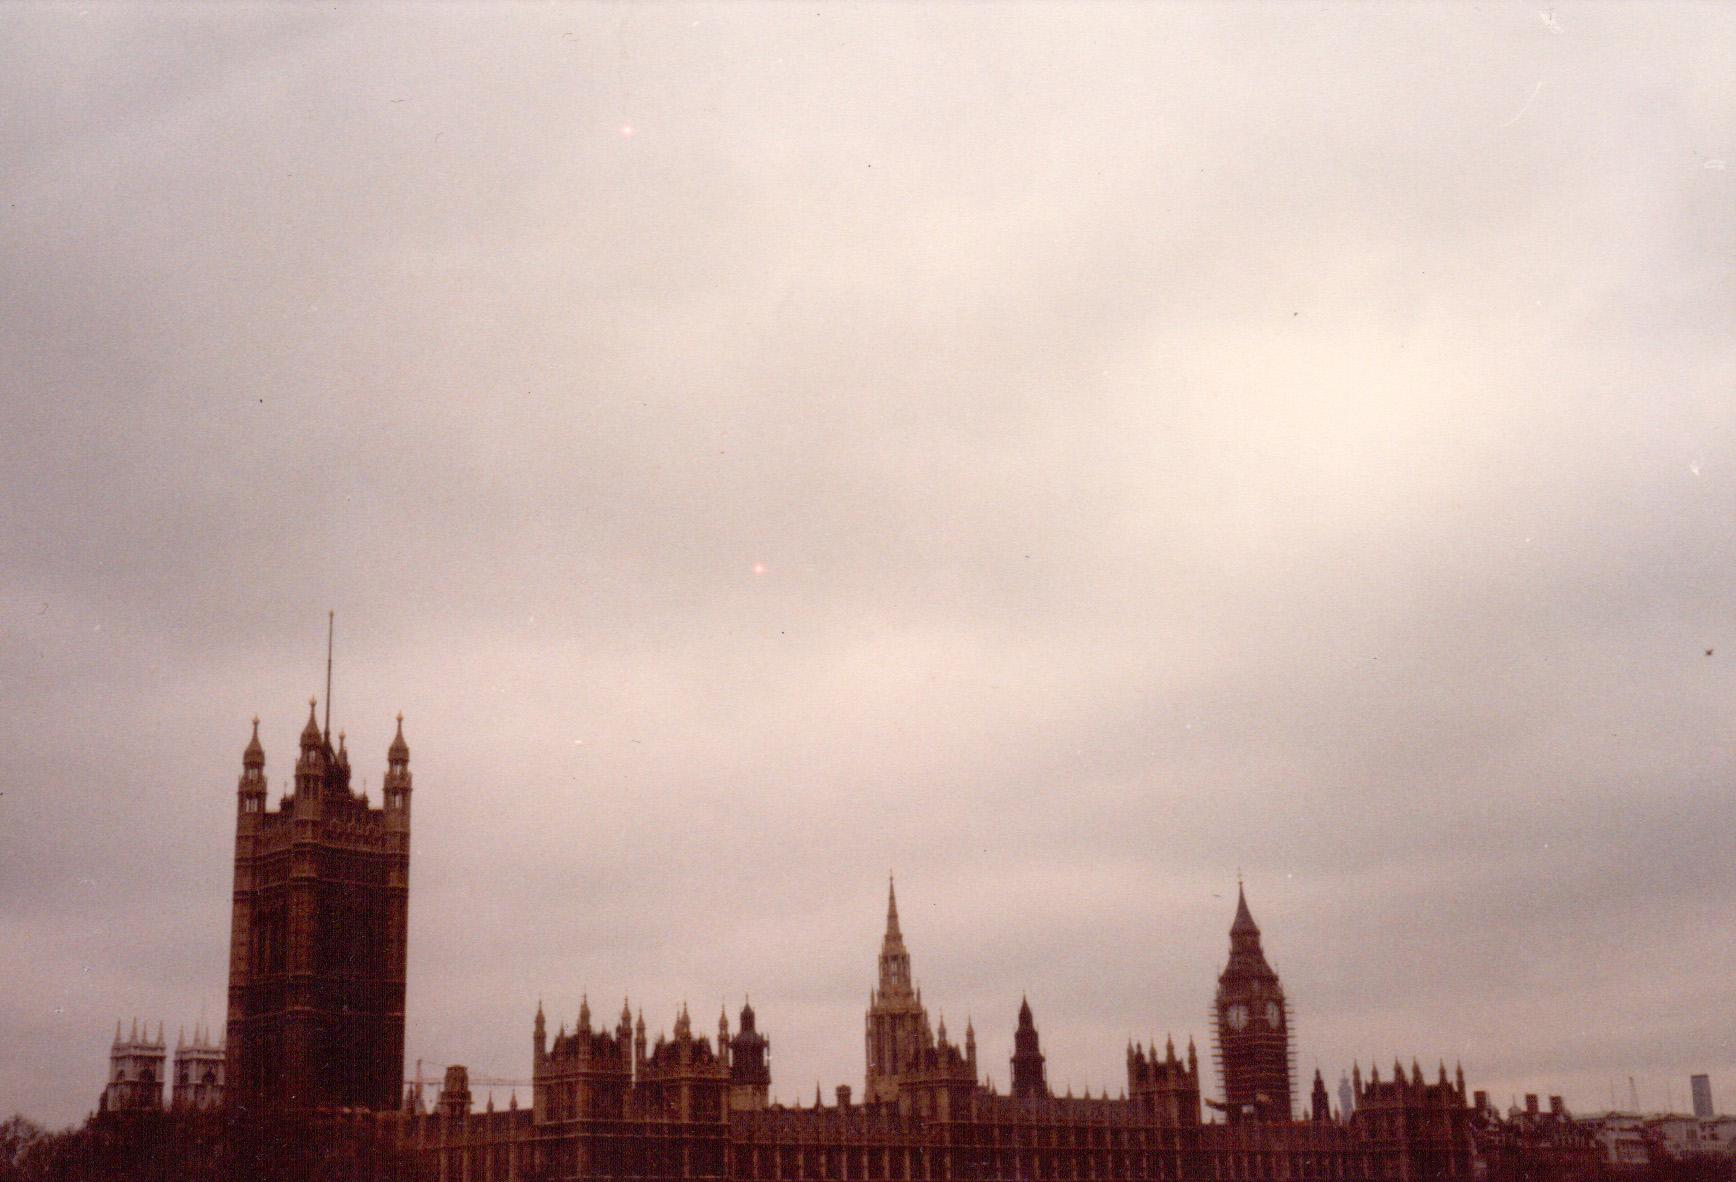 John Latham Distress over Parliament two marine distress flares, May 1, 1983 ( OFFSITE —  Distress Over Parliament  1)